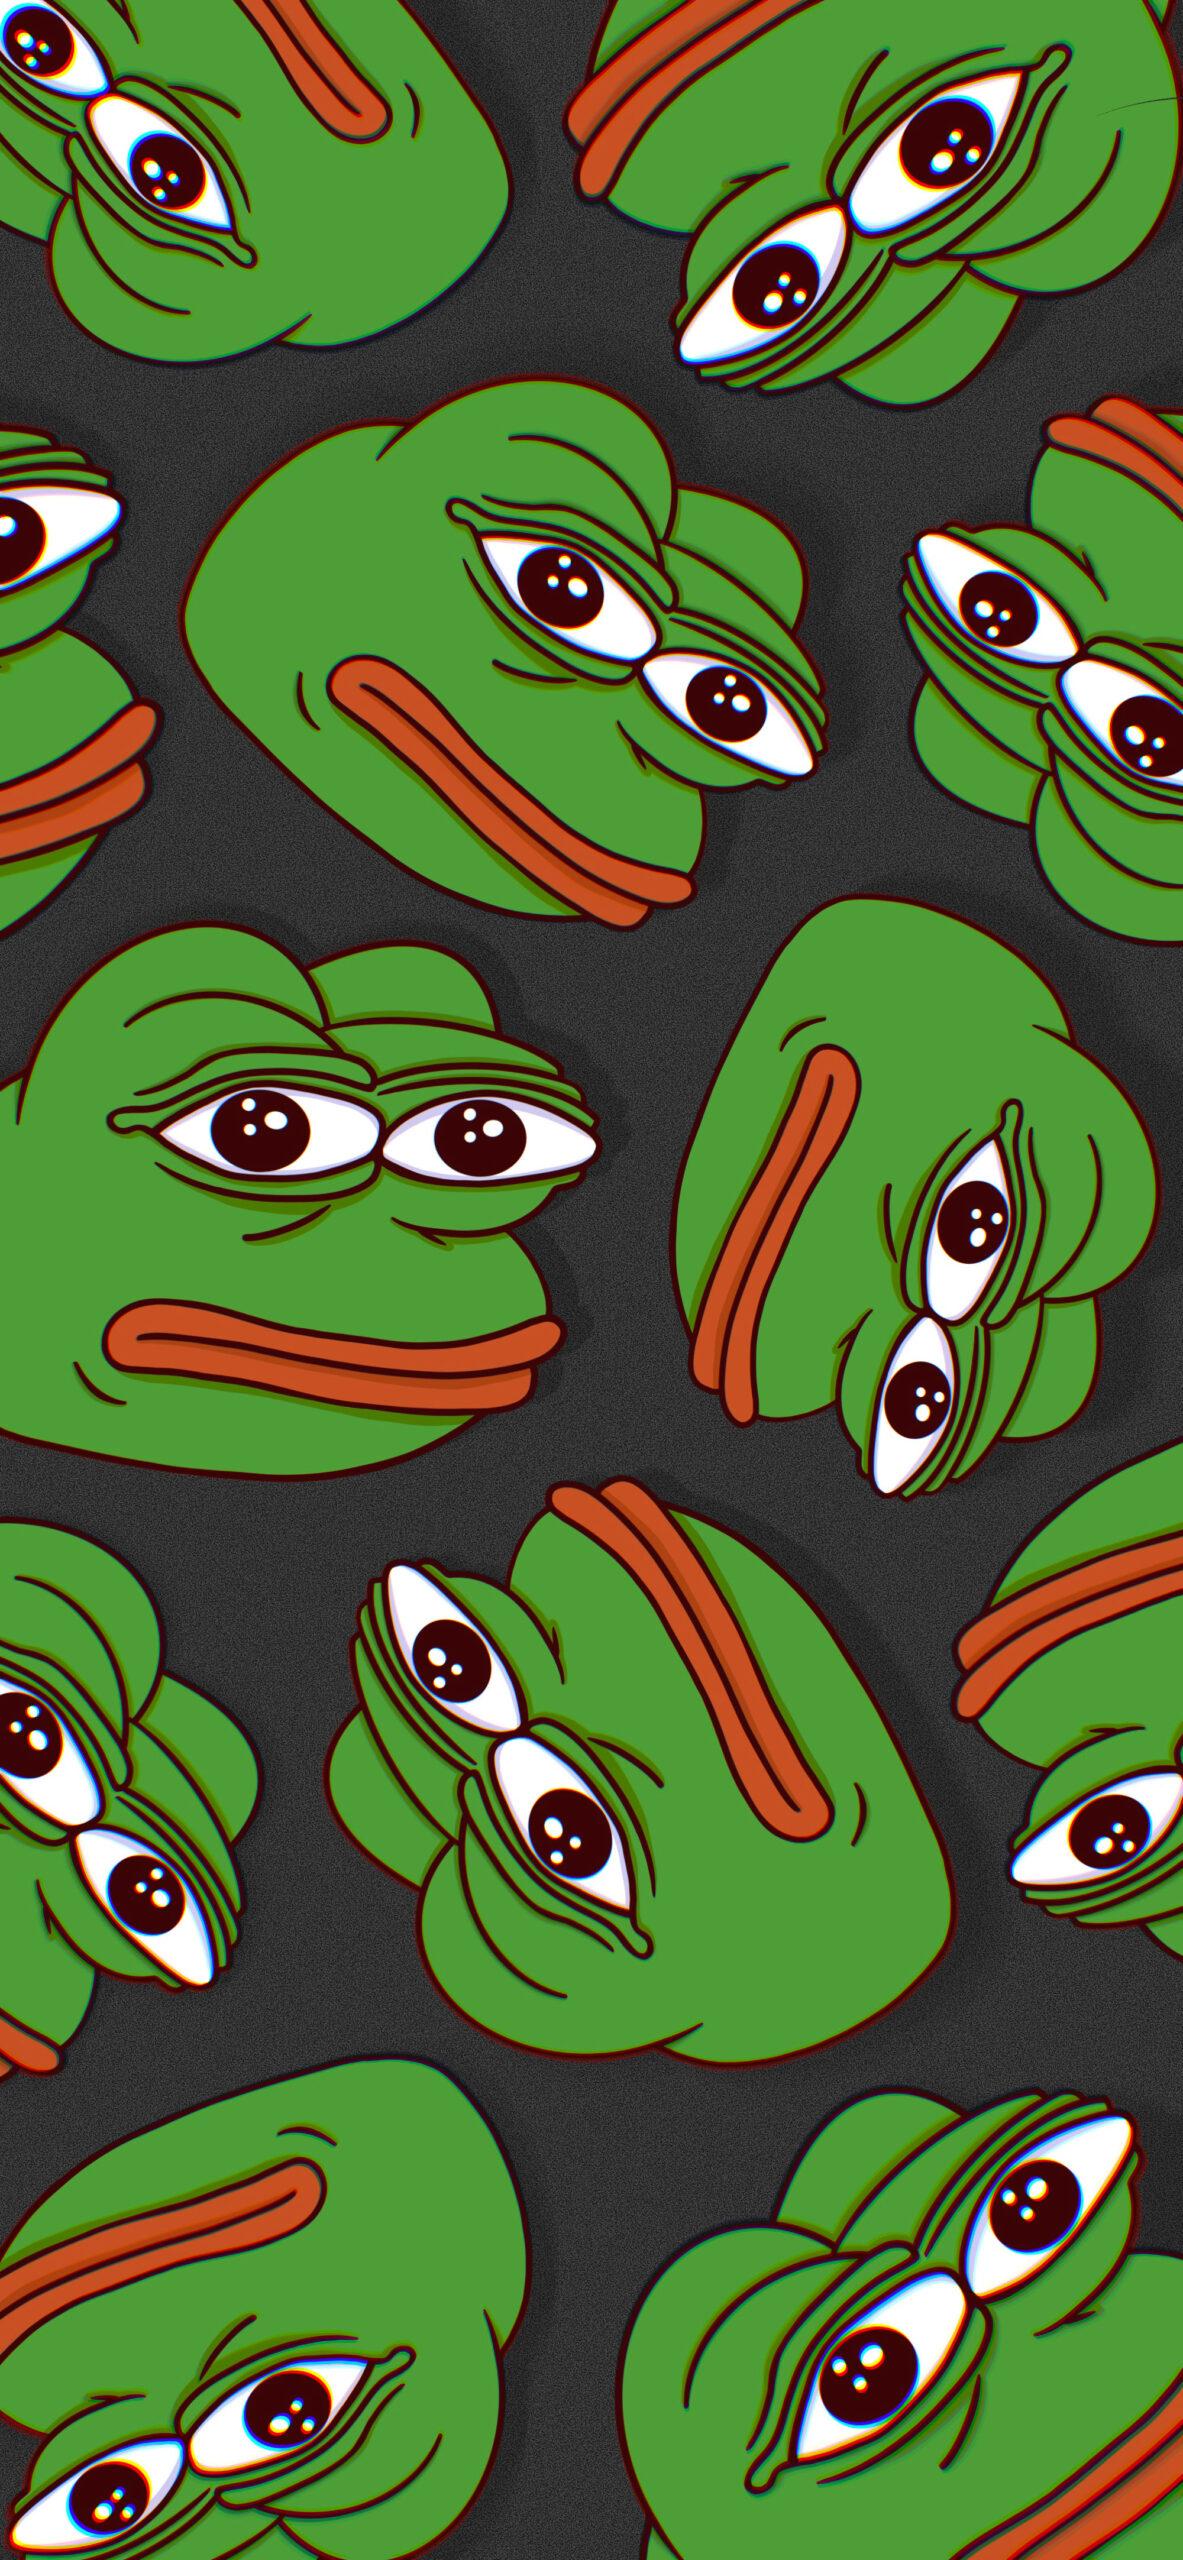 pepe the frog black meme wallpaper